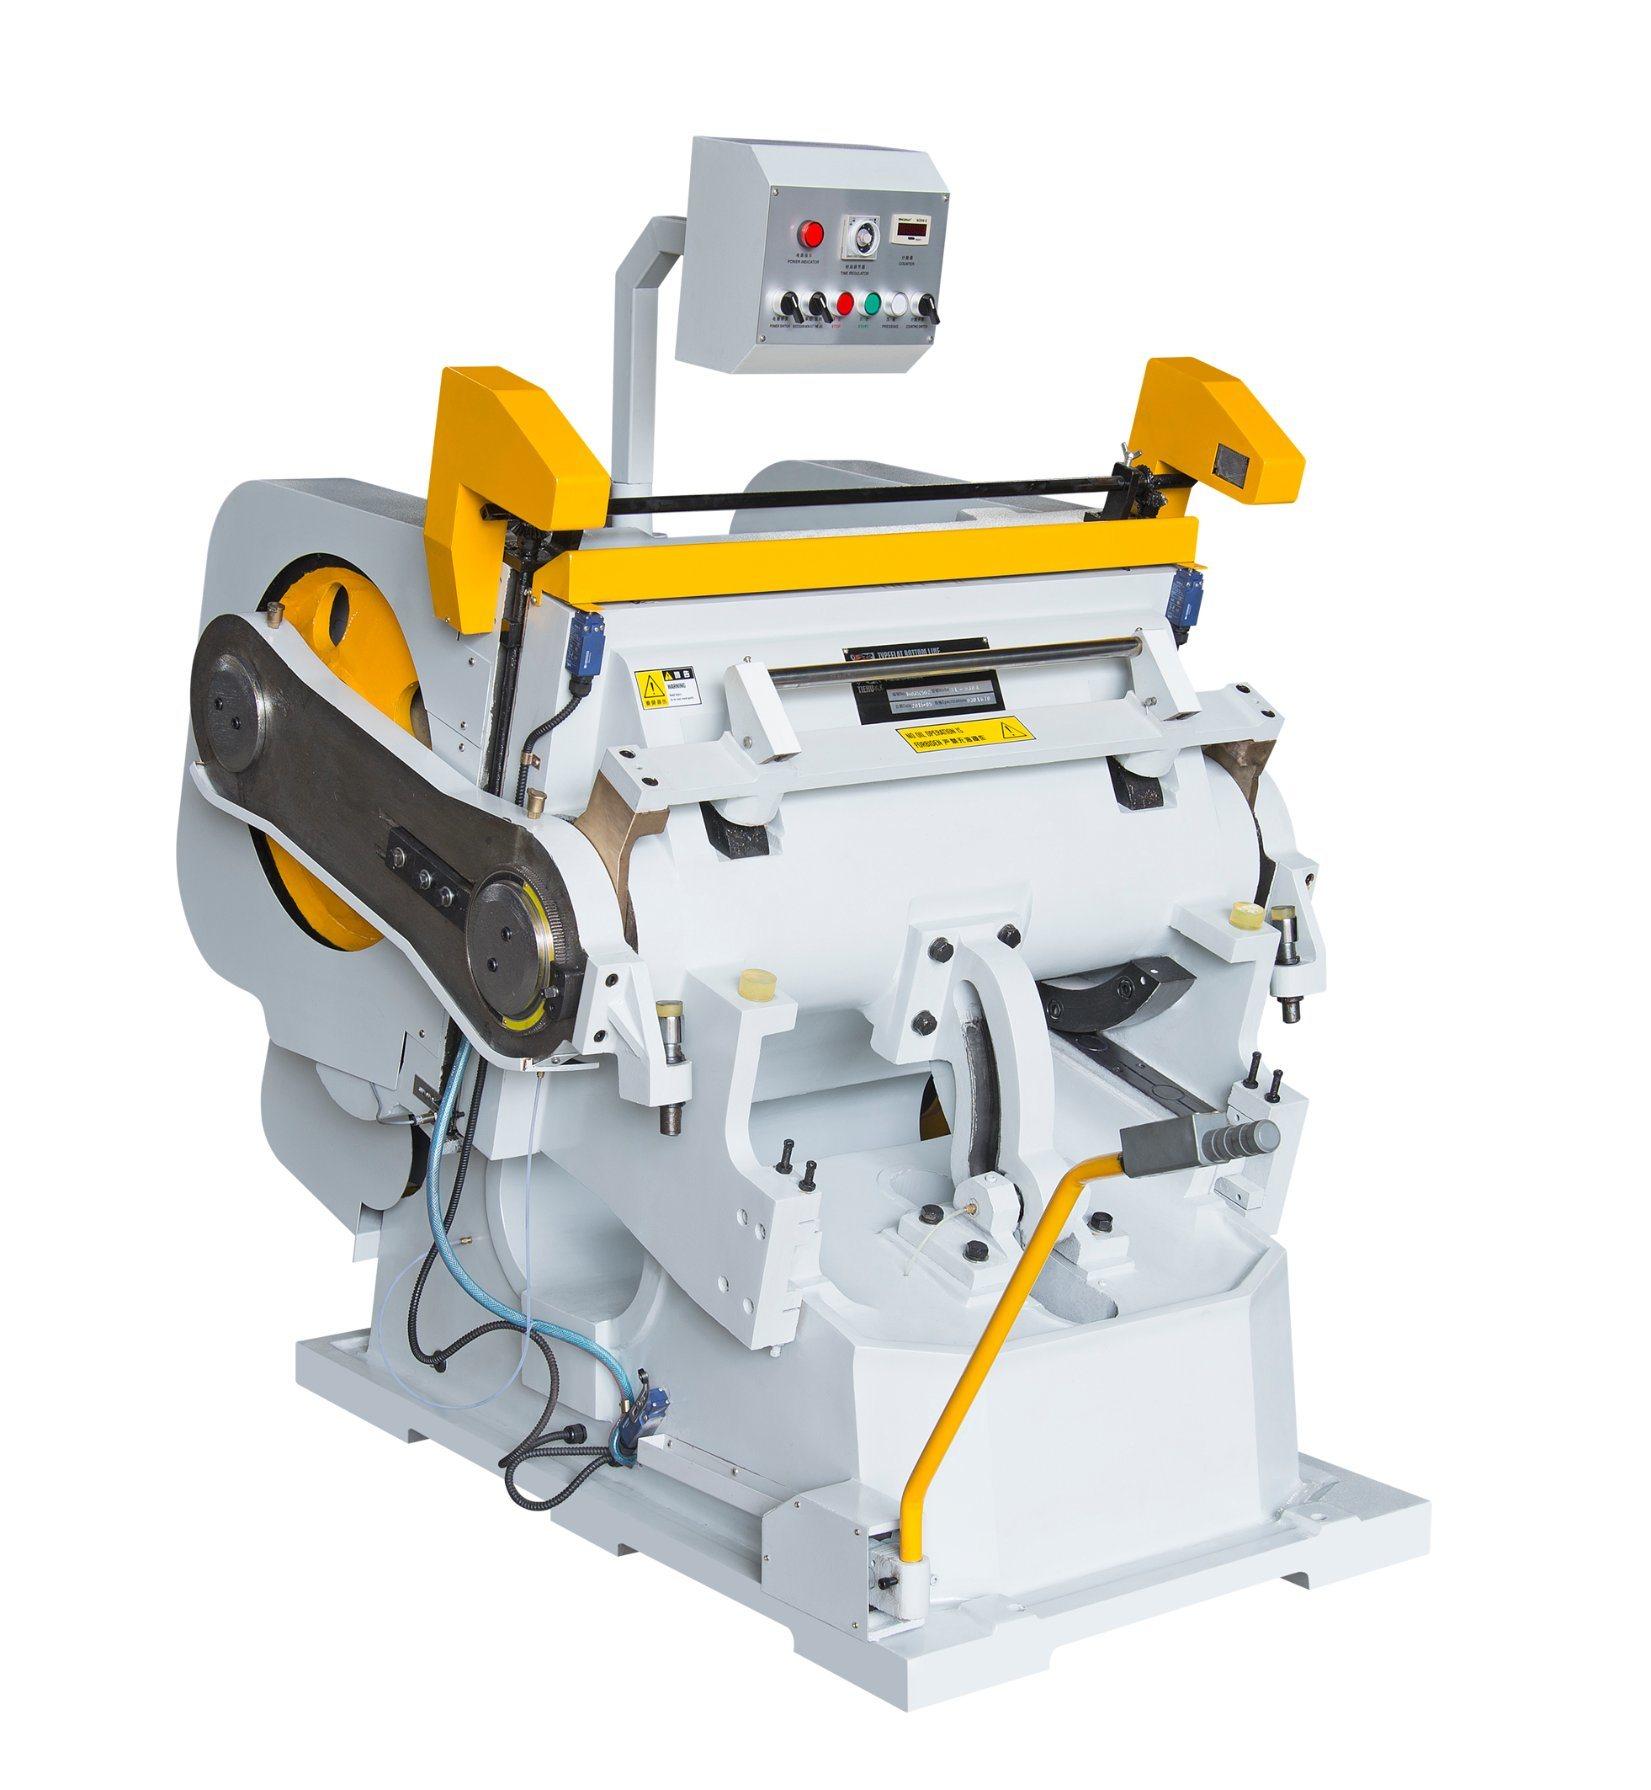 Heating Creasing and Die Cutting Machine (Ml-1100xj)